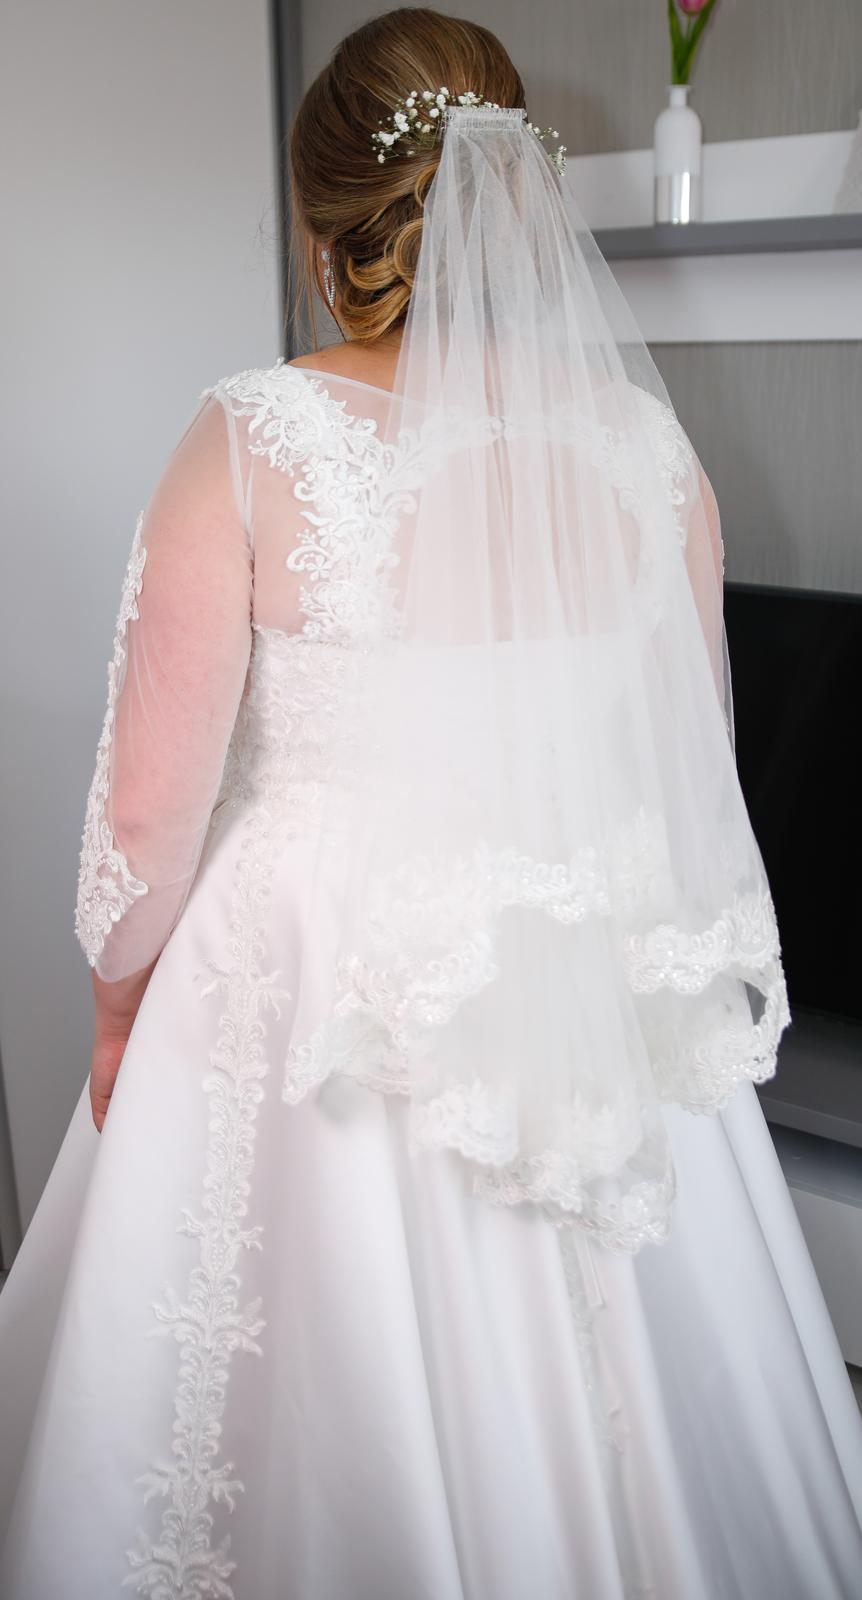 Svadobné šaty satén, čipka 46-50 - Obrázok č. 4